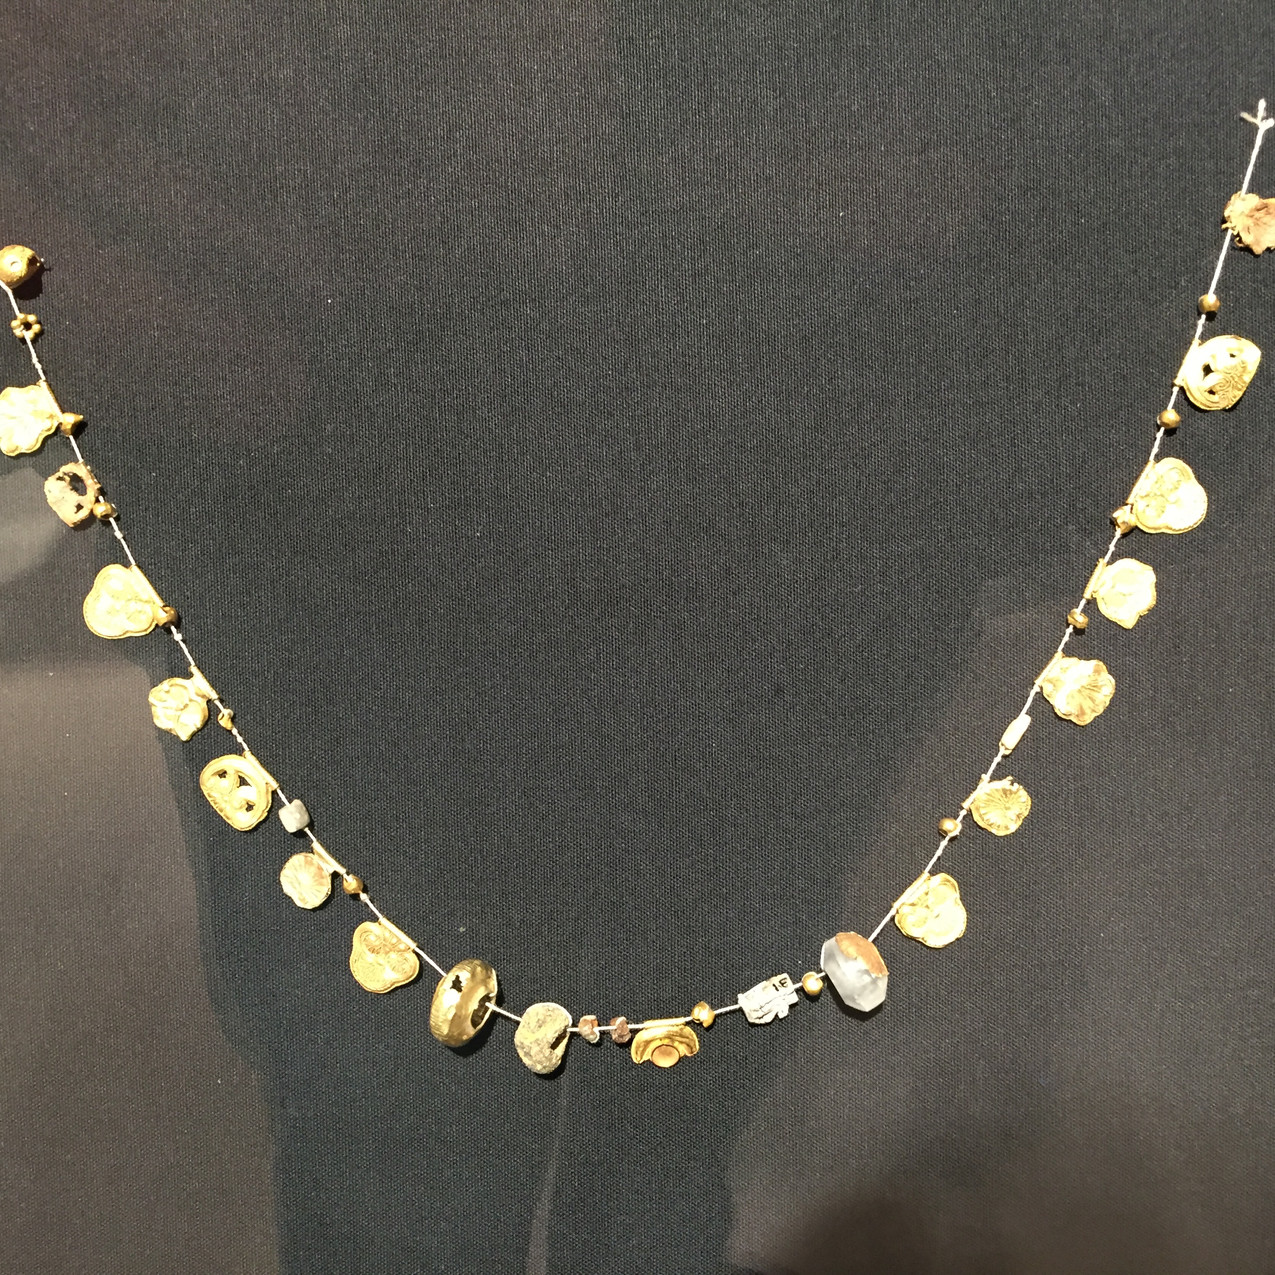 Phoenician necklace